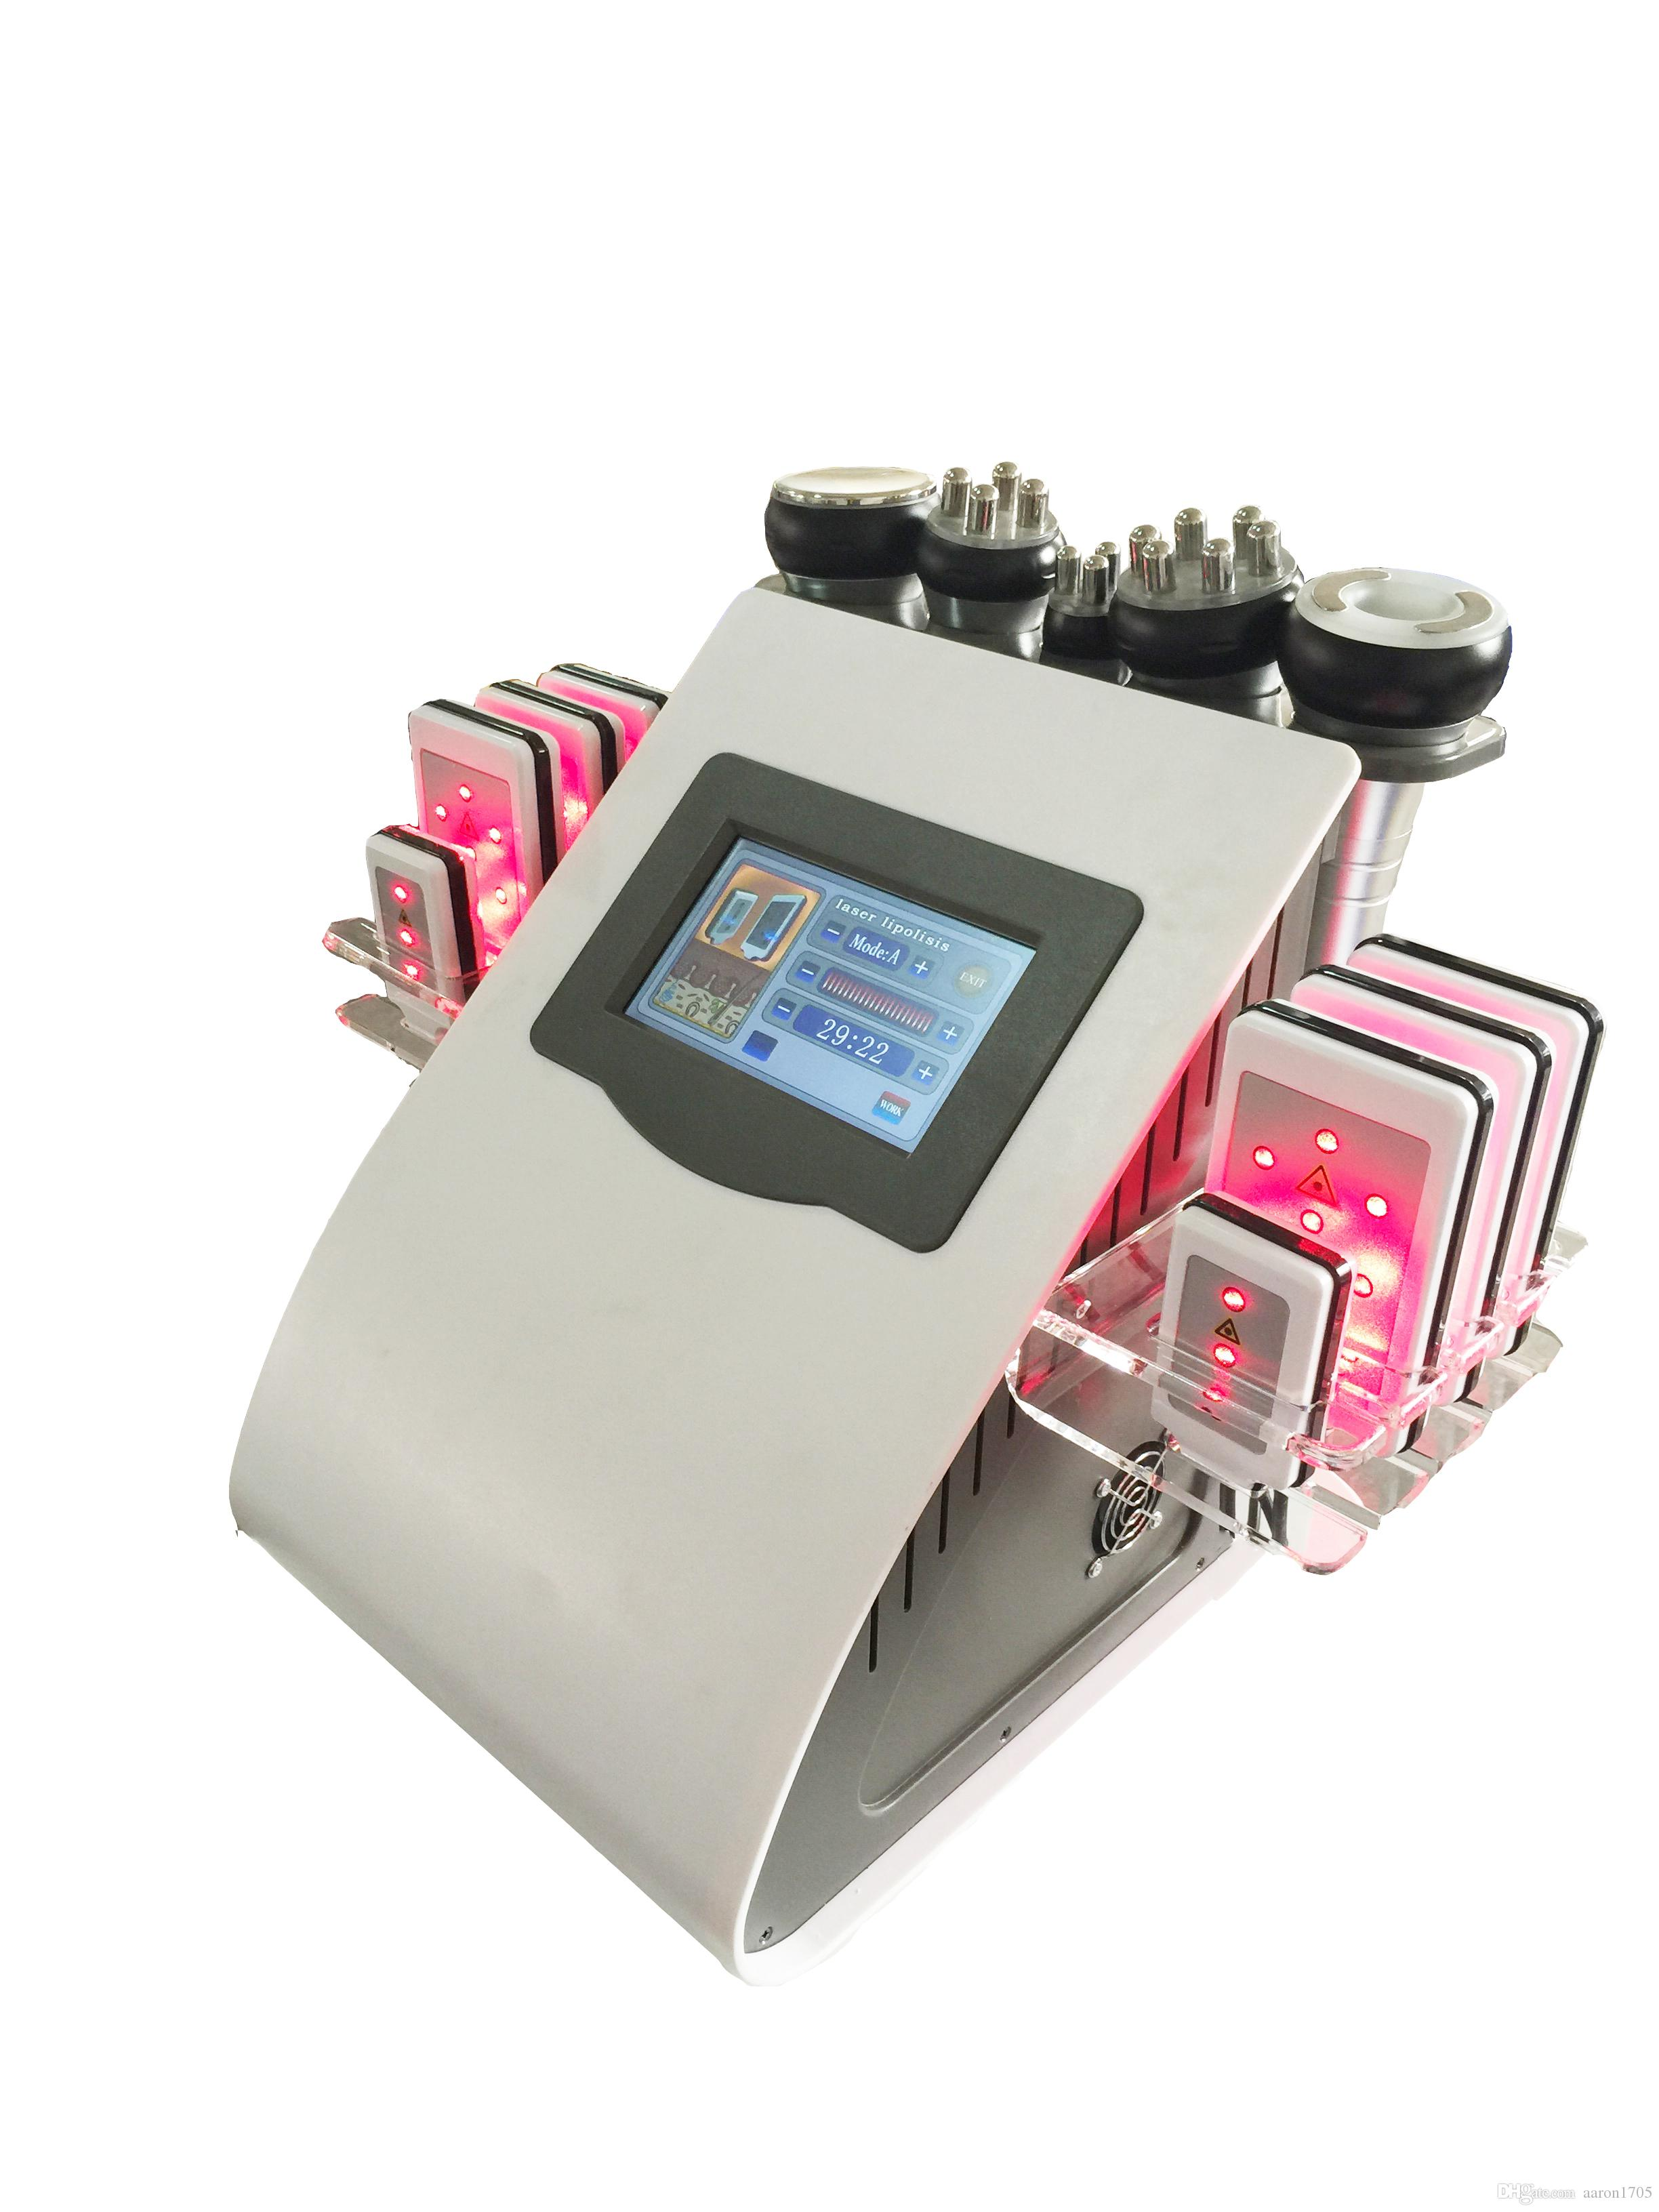 40K cavitation 다극 RF 진공 지방 흡입 수술 장비 LLLT lipo 레이저 미용 장비 피부 관리 살롱 스파 슬리밍 기계